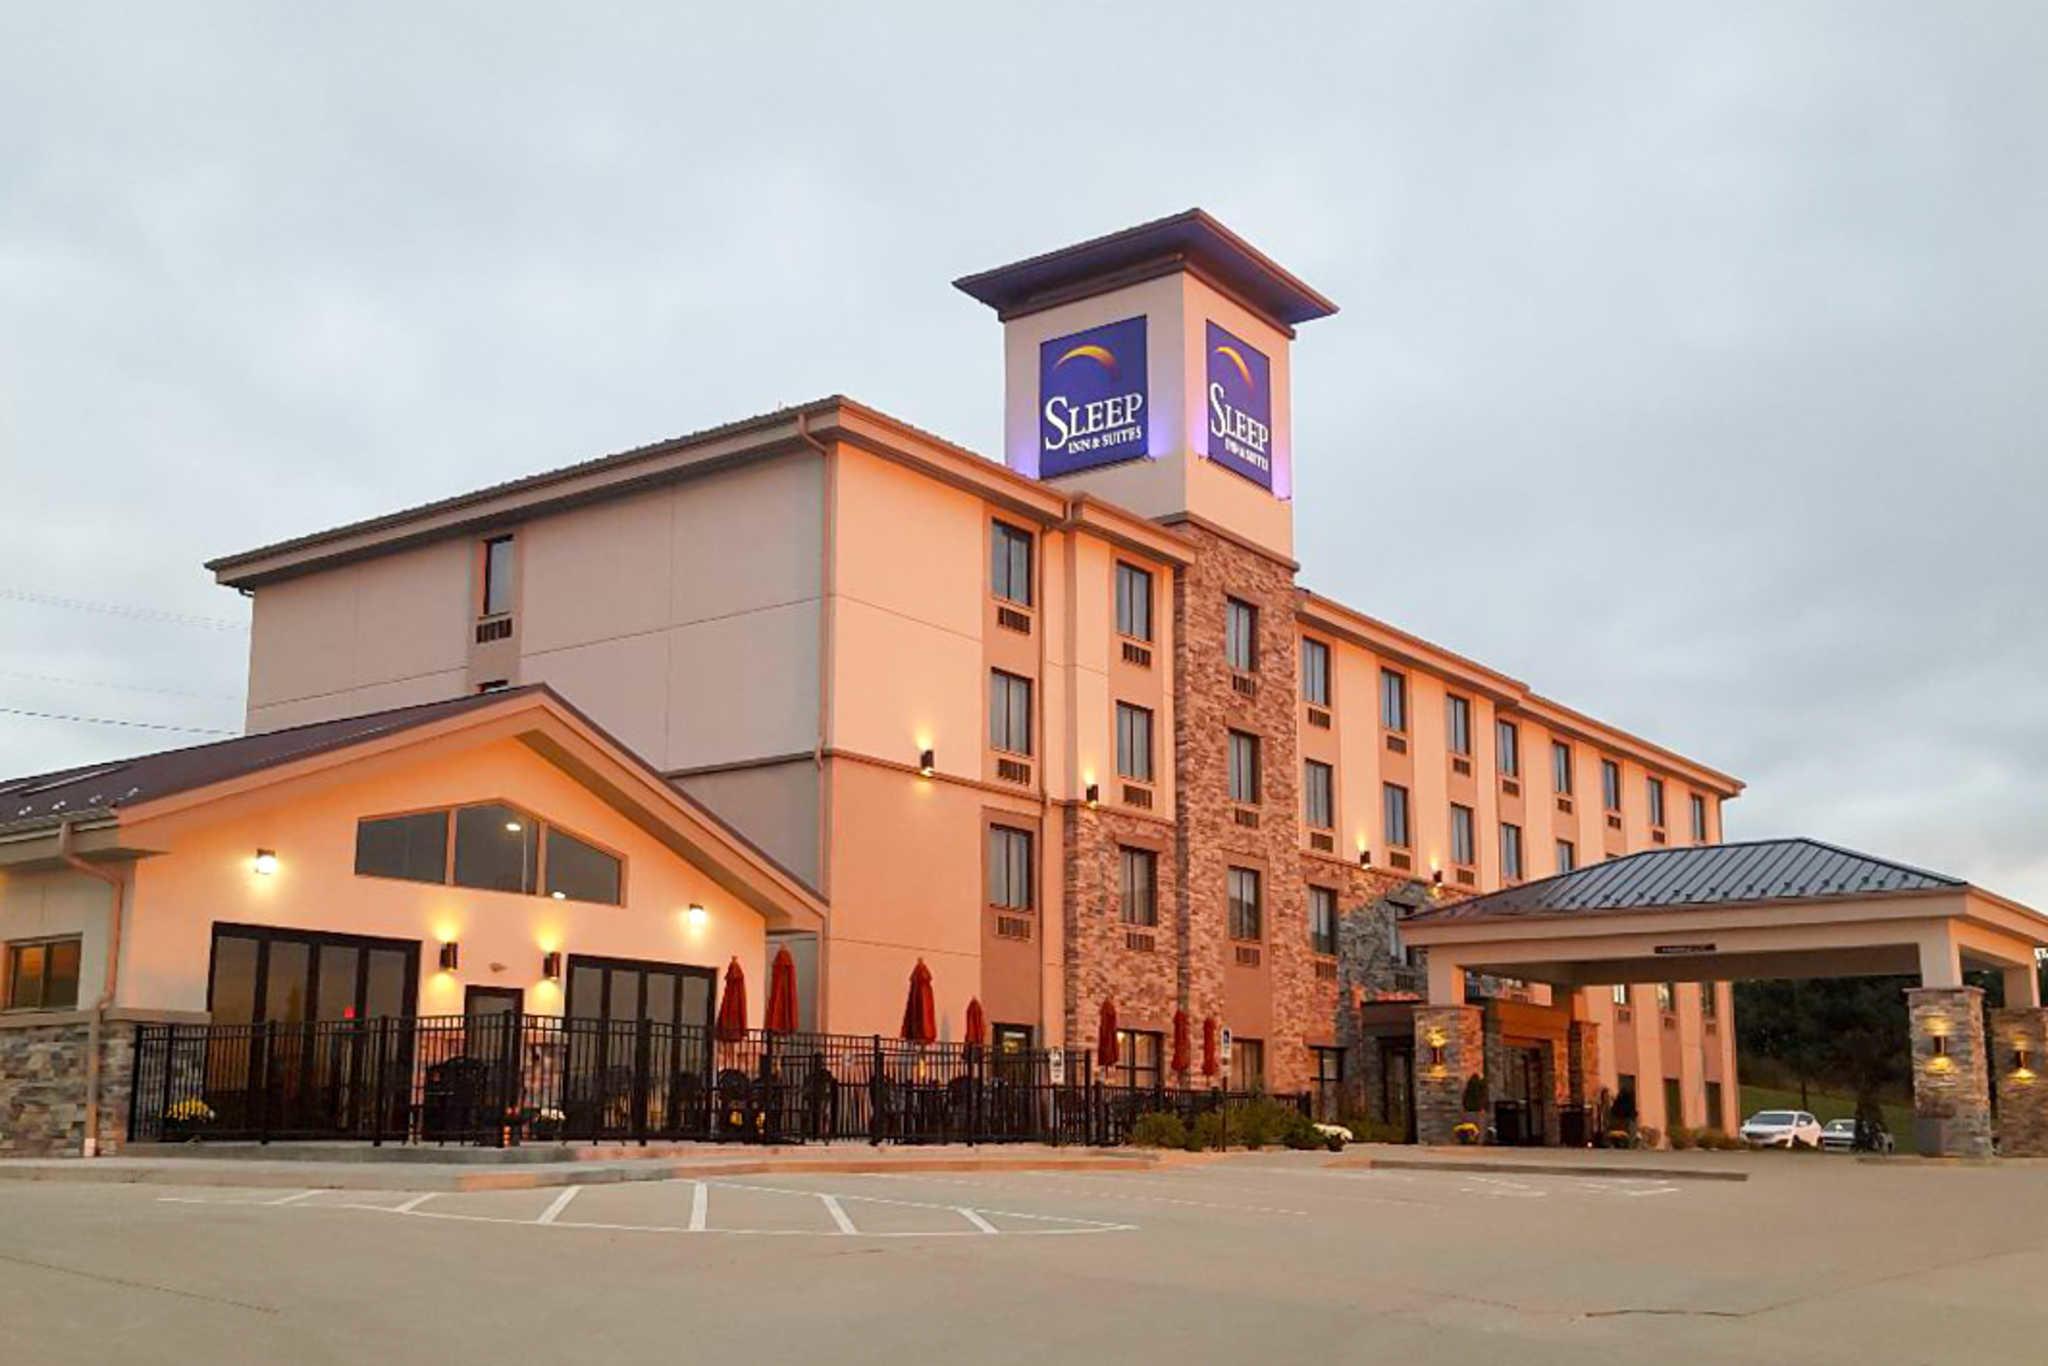 Sleep Inn & Suites Belmont / St. Clairsville image 0